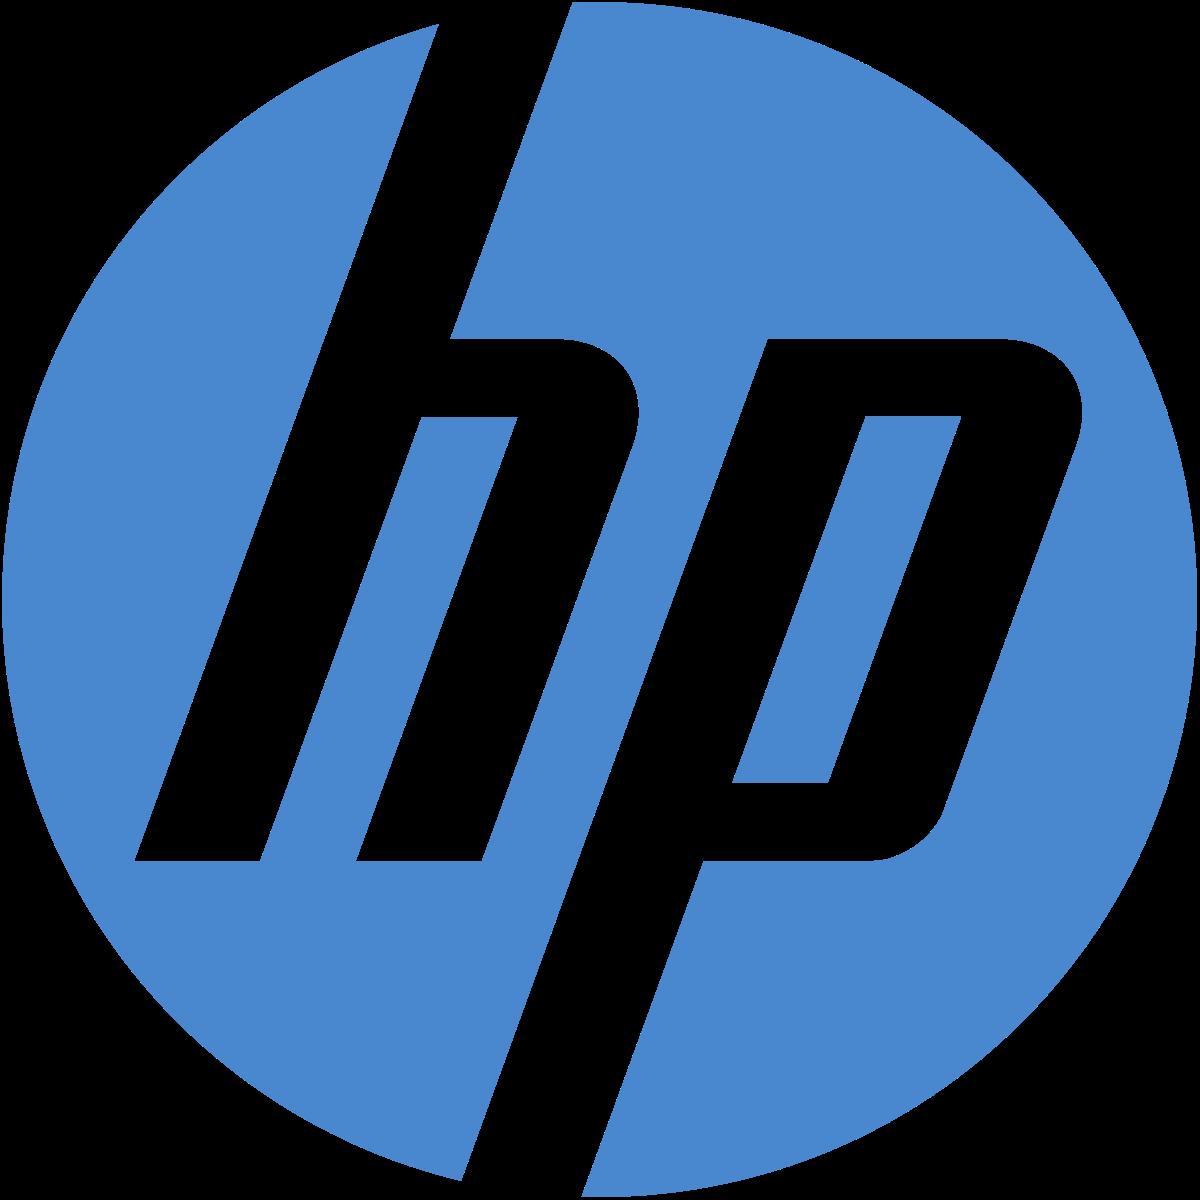 HP徽标是会标的一个示例